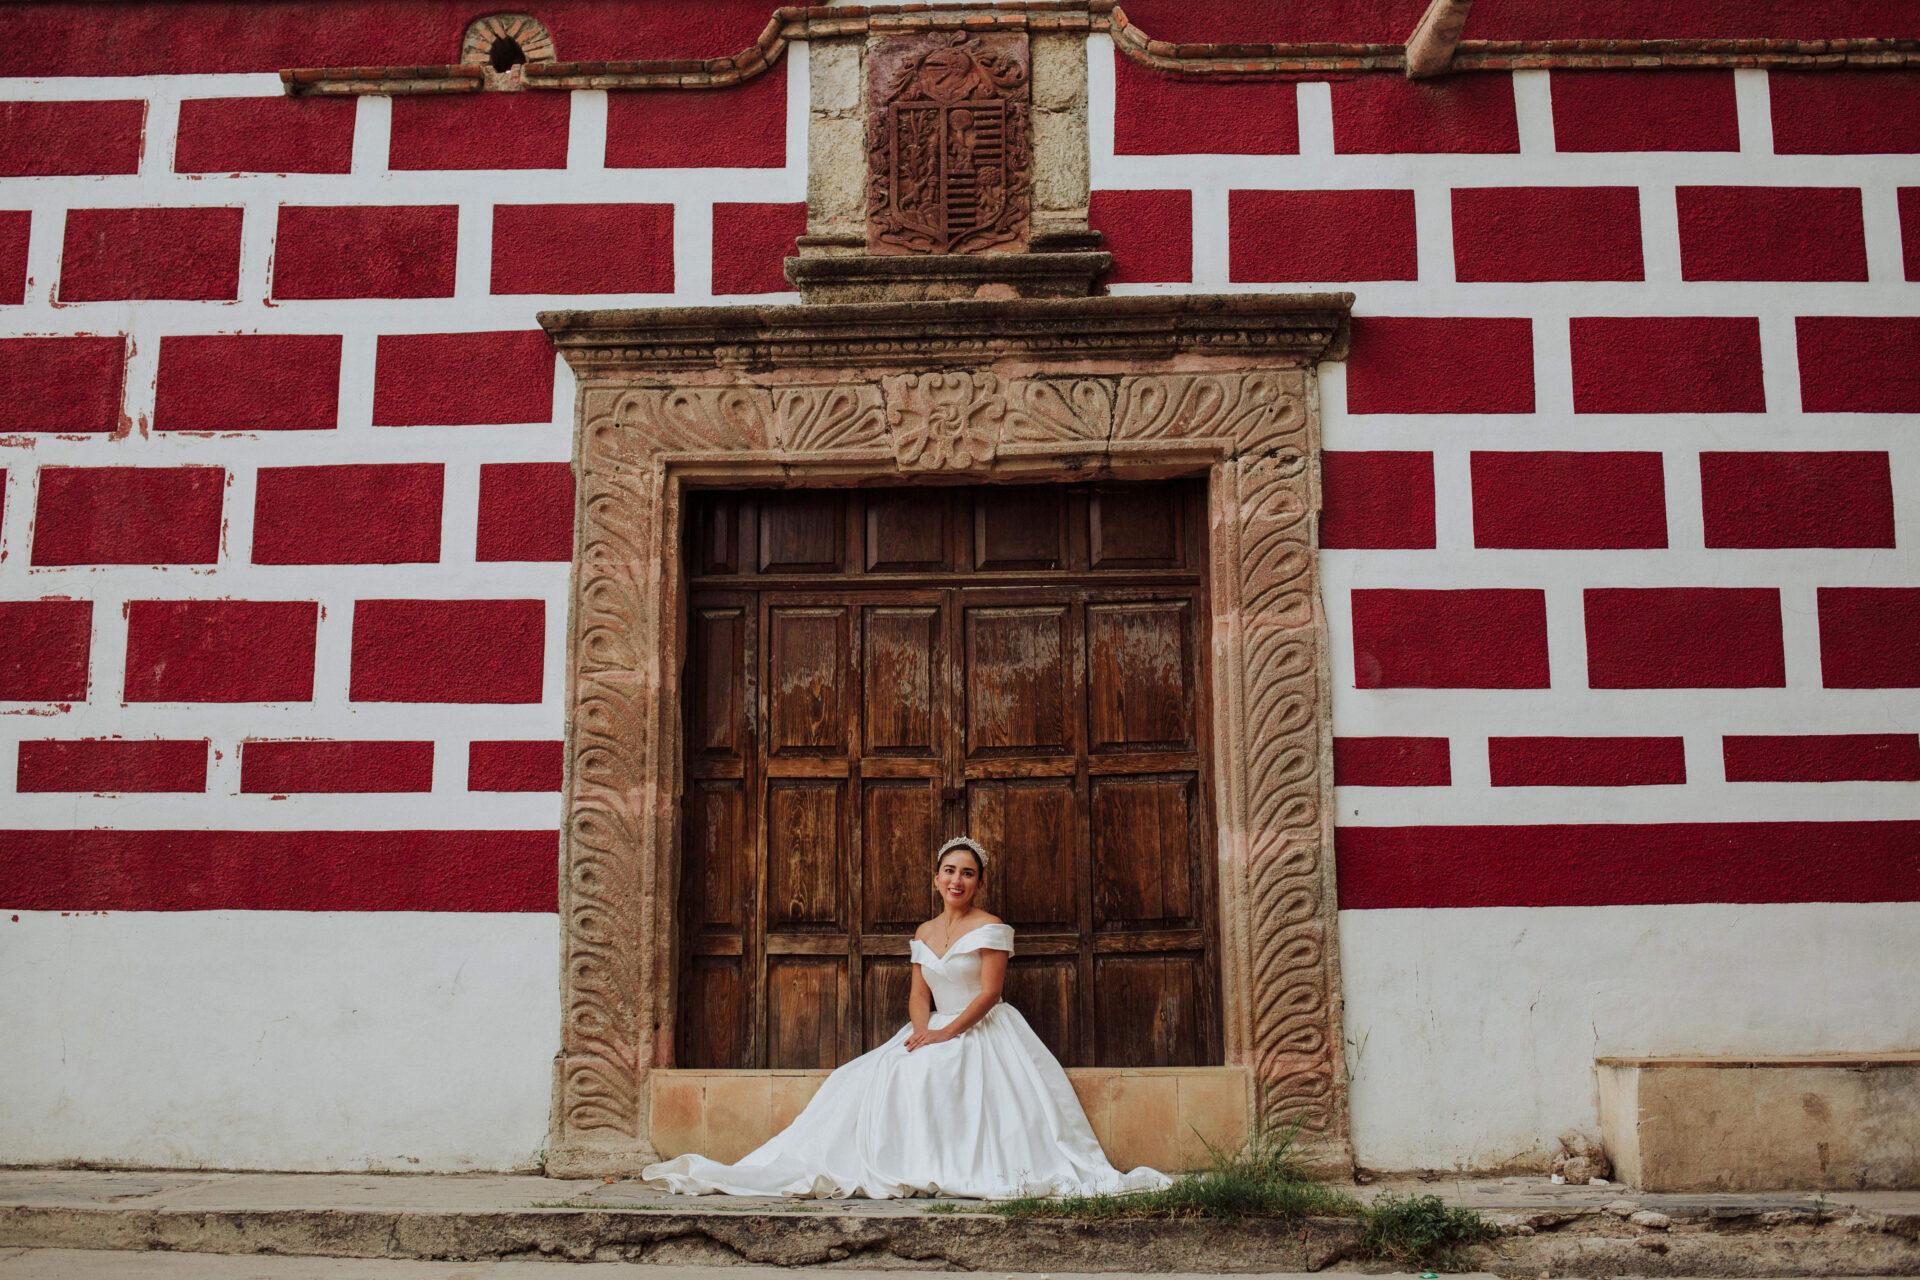 javier_noriega_fotografo_bodas_zacatecas_aguascalientes_asientos00013